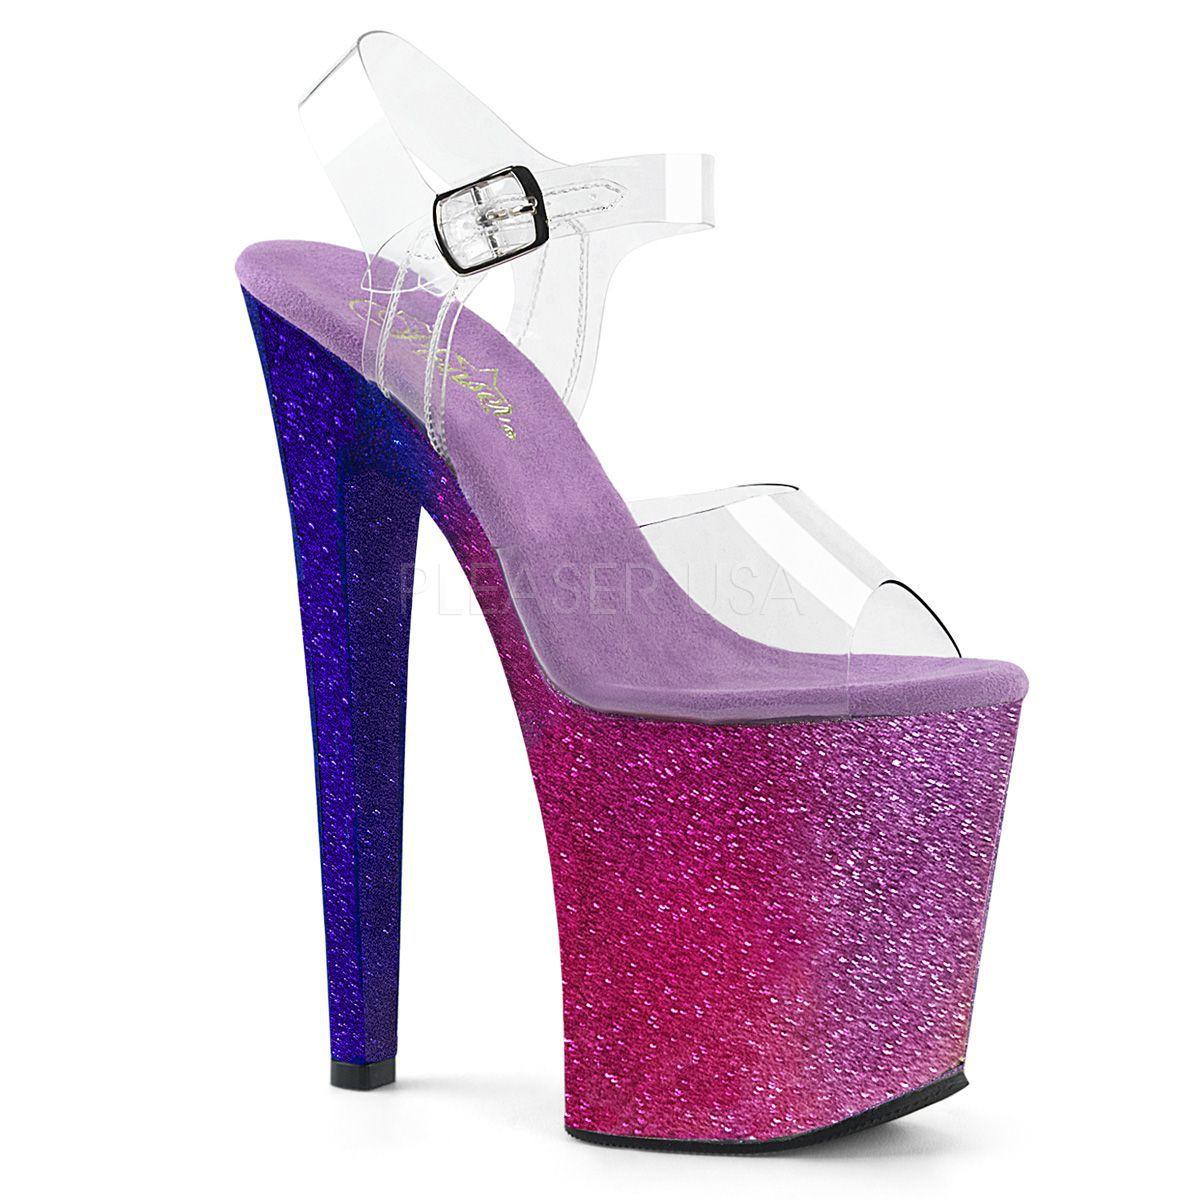 Sandalias Pole Dance XTREME con purpurina brillante efecto degradado